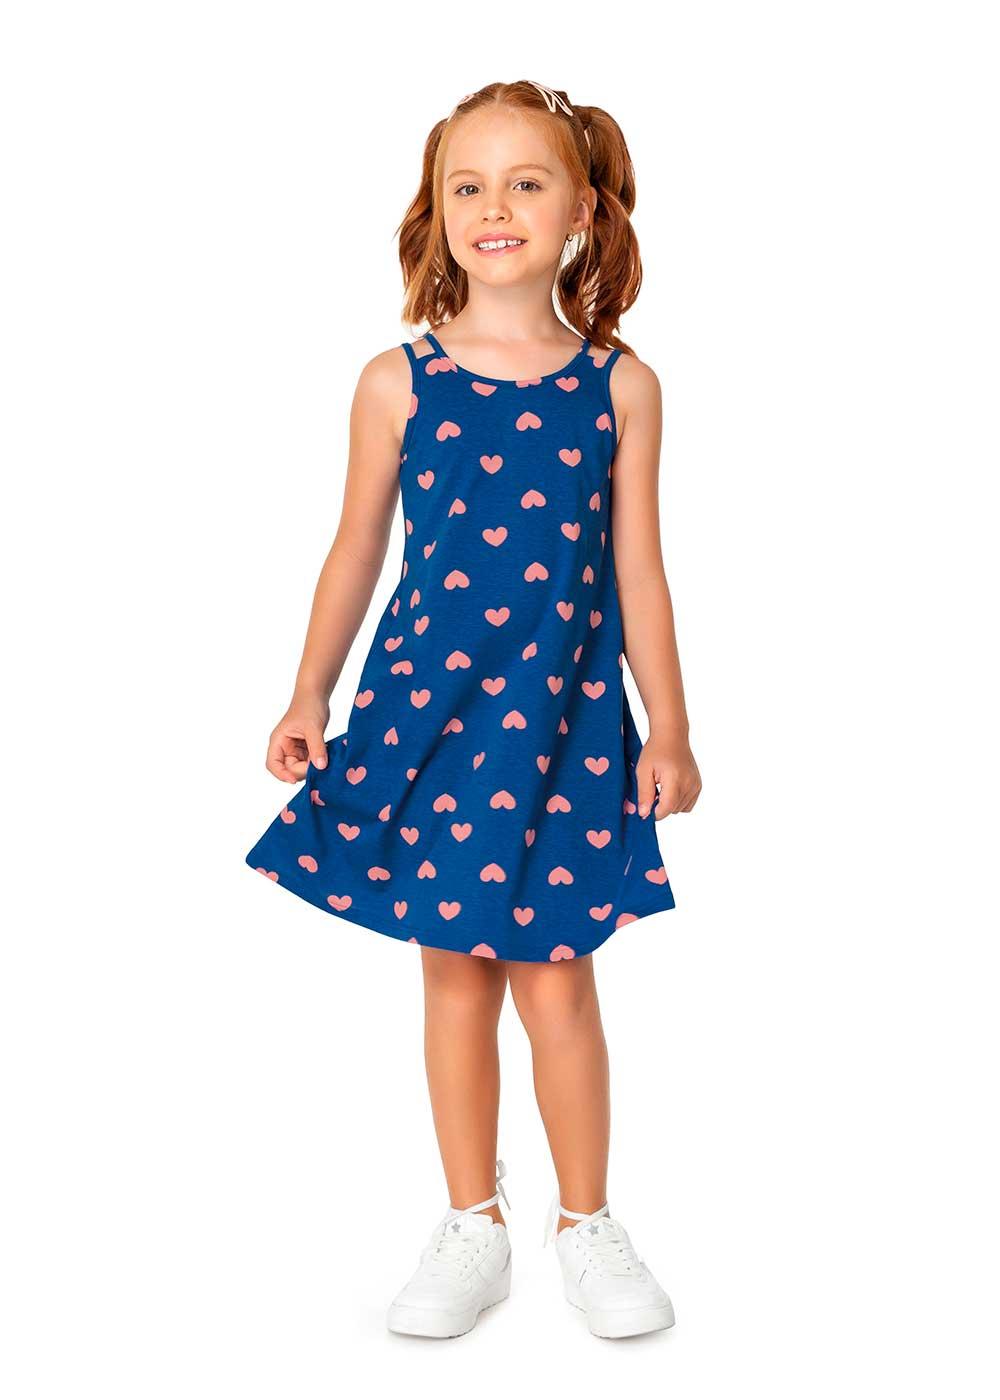 Vestido Infantil Curto Azul Corações - Malwee